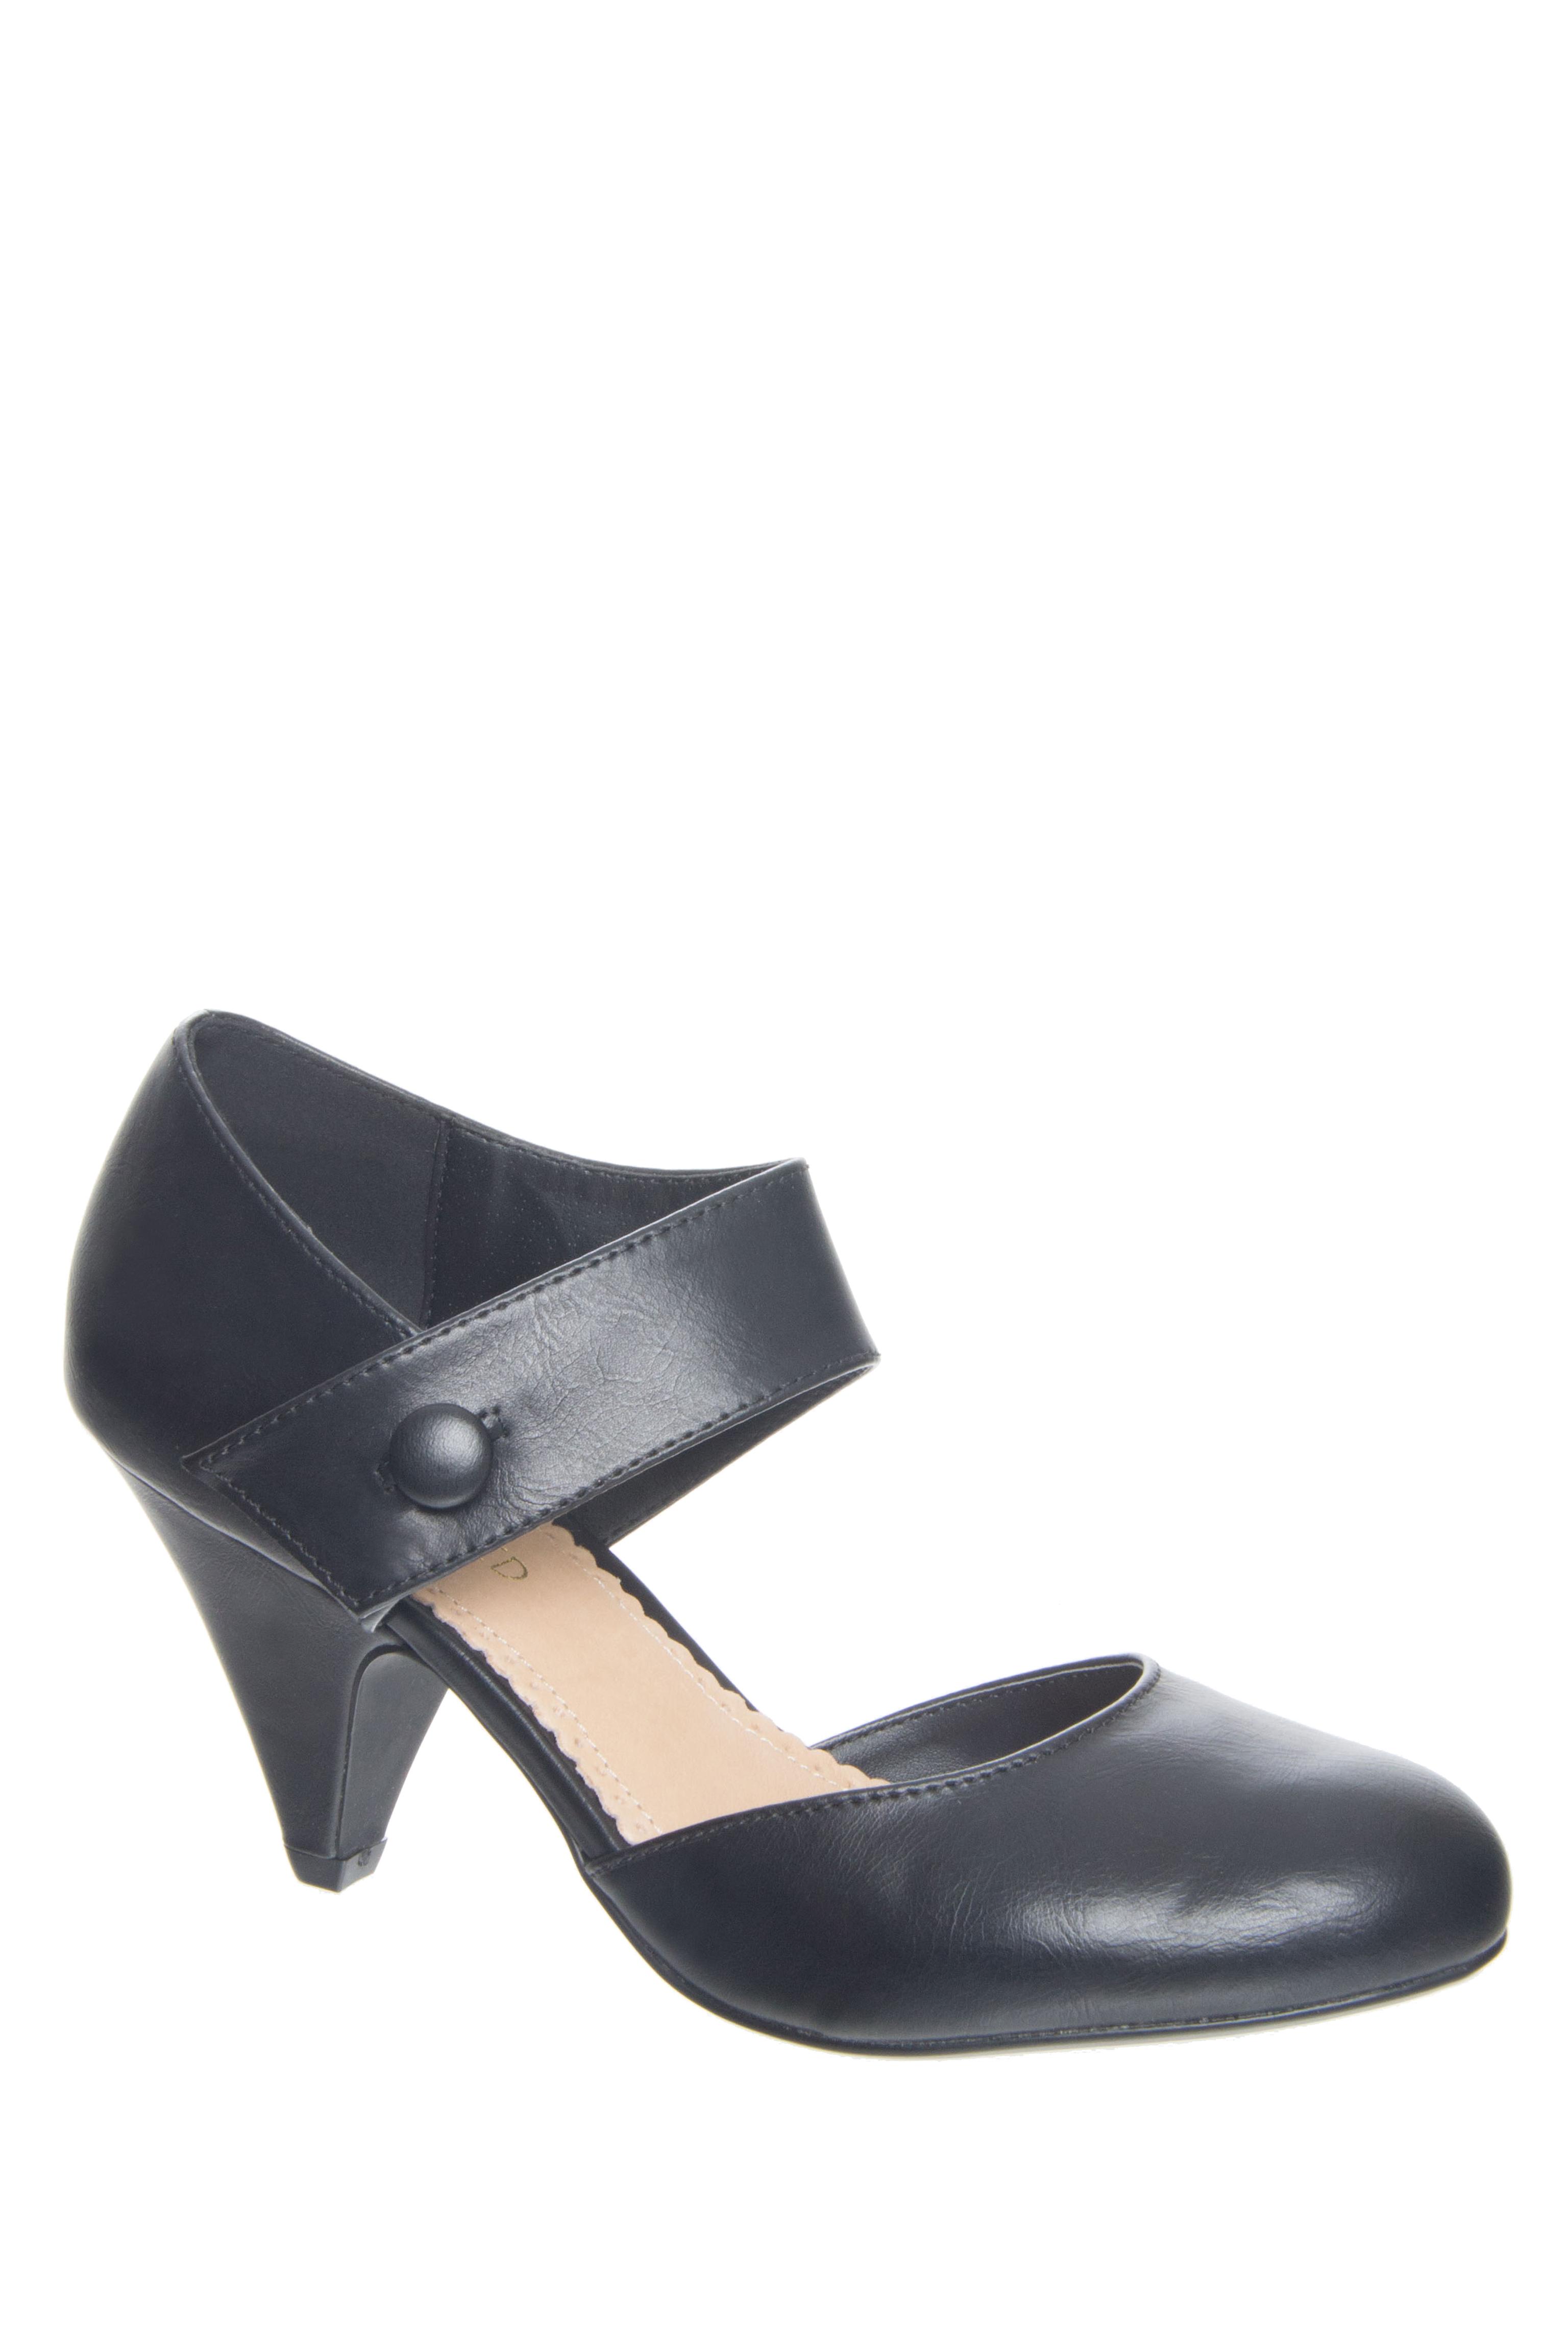 Restricted Chatroom Mid Heel Pumps - Black